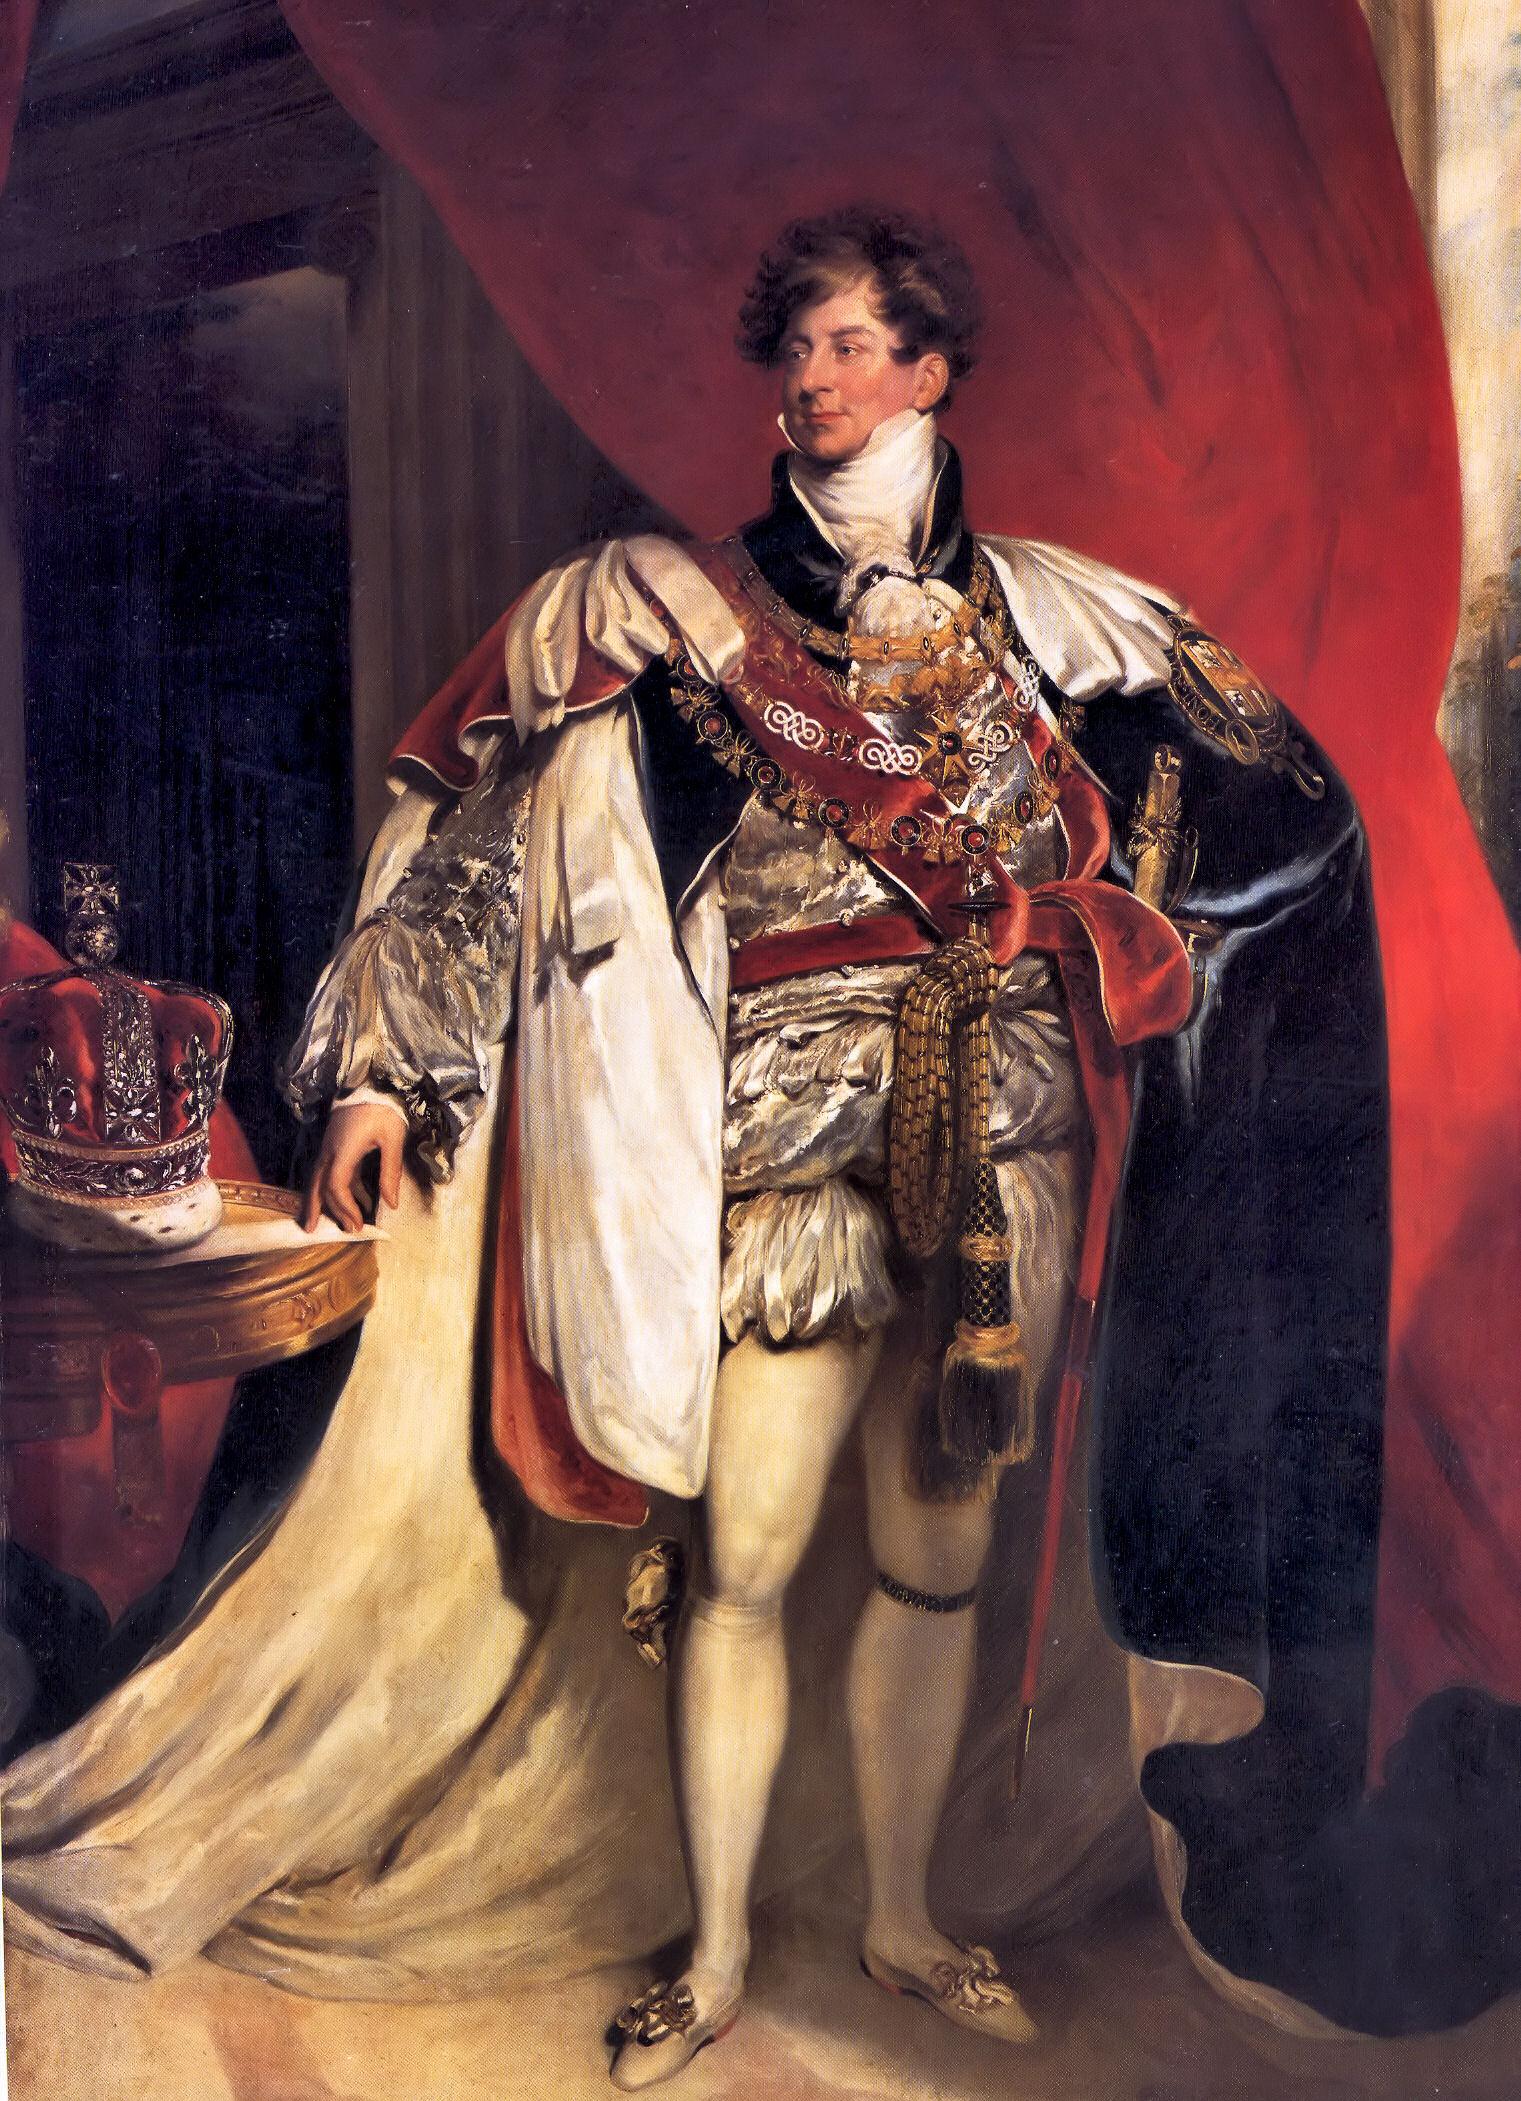 Depiction of Jorge IV del Reino Unido